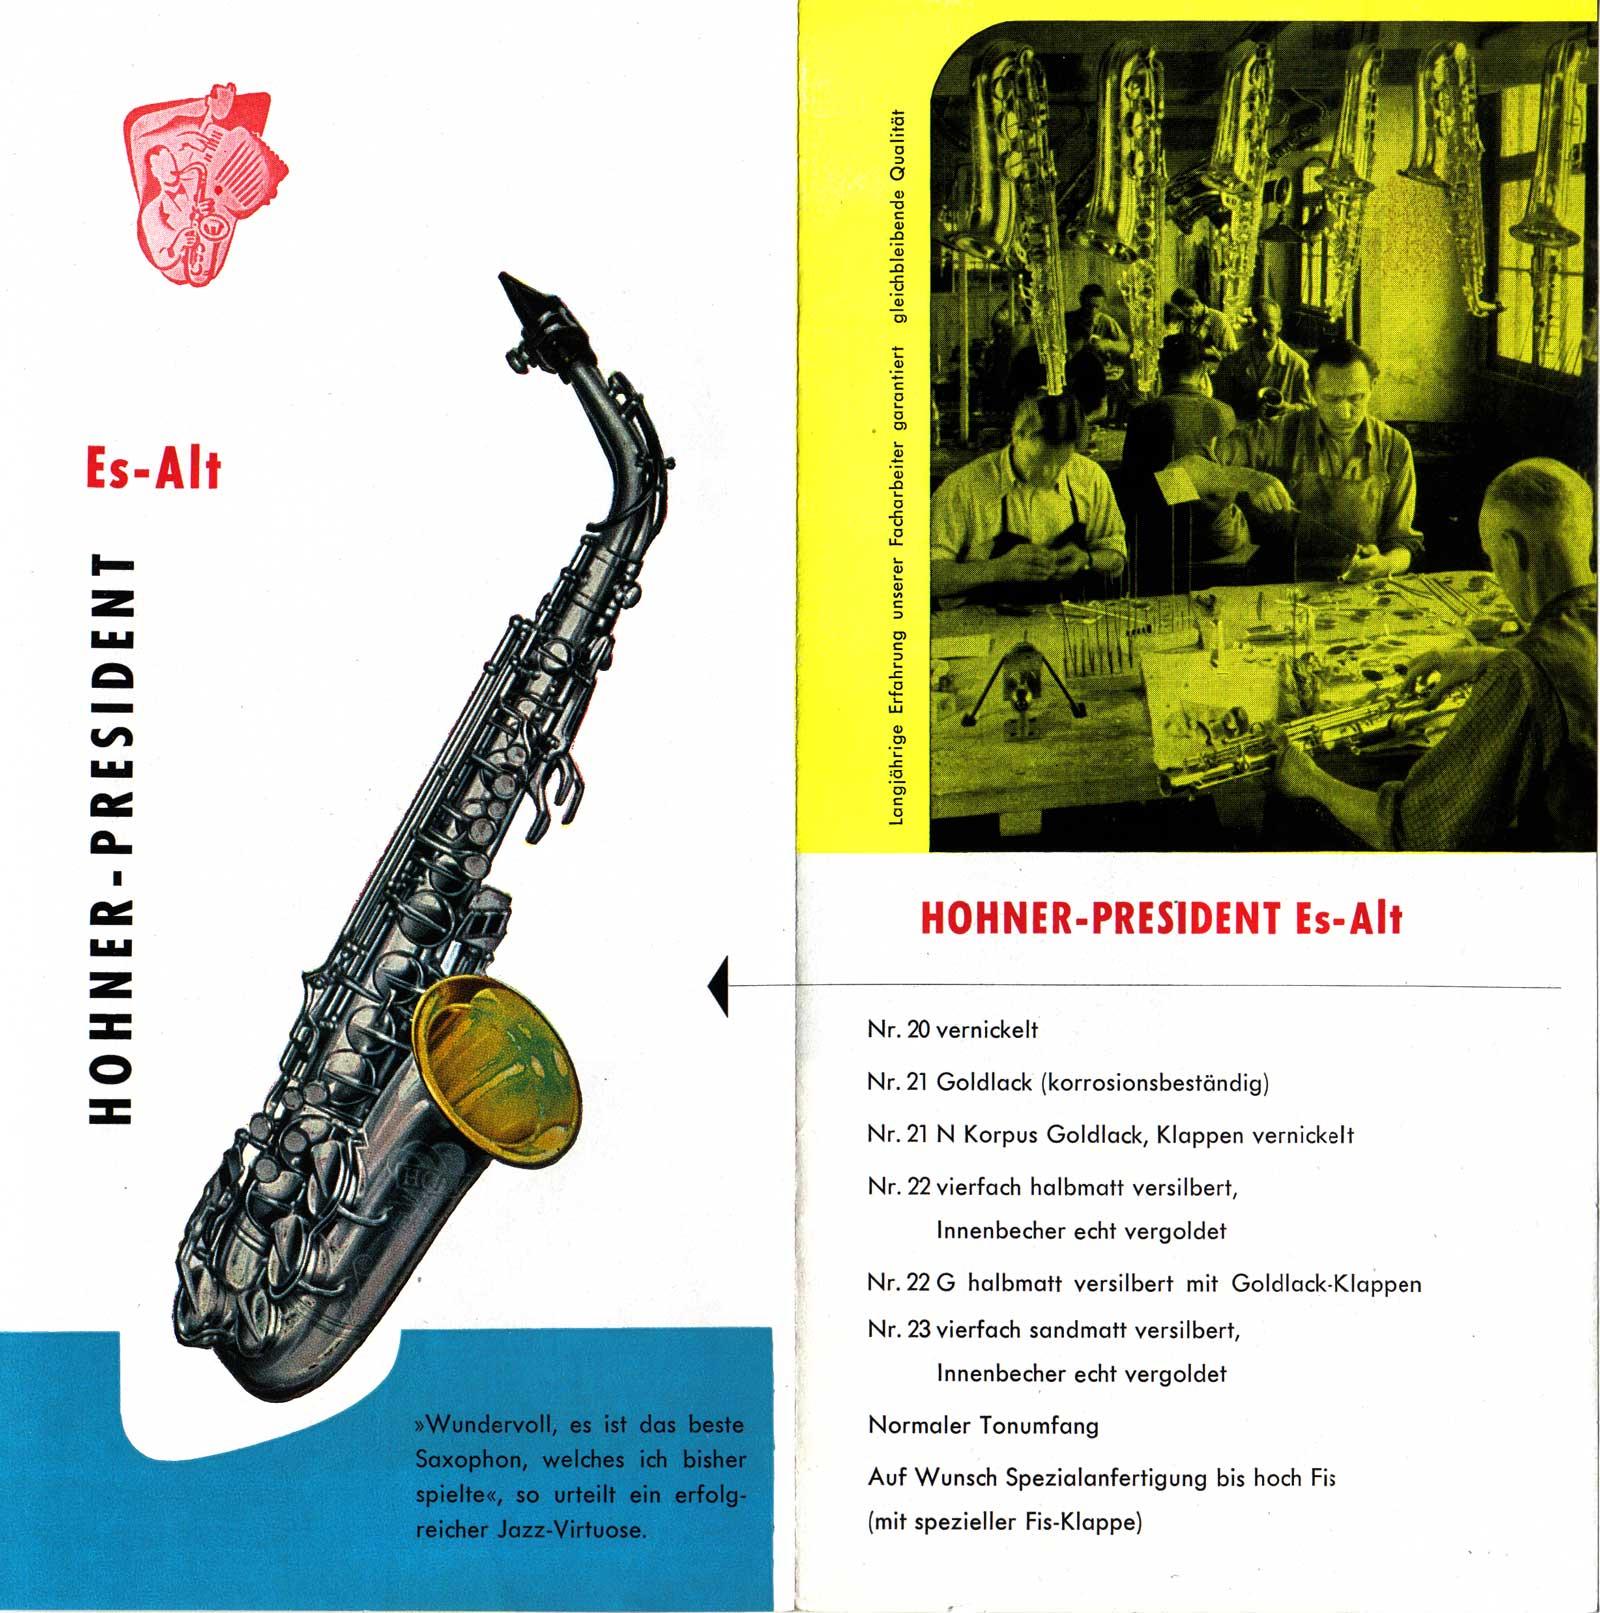 President alto saxophone, vintage brochure, 1958, German, vintage saxophone, Hohner President